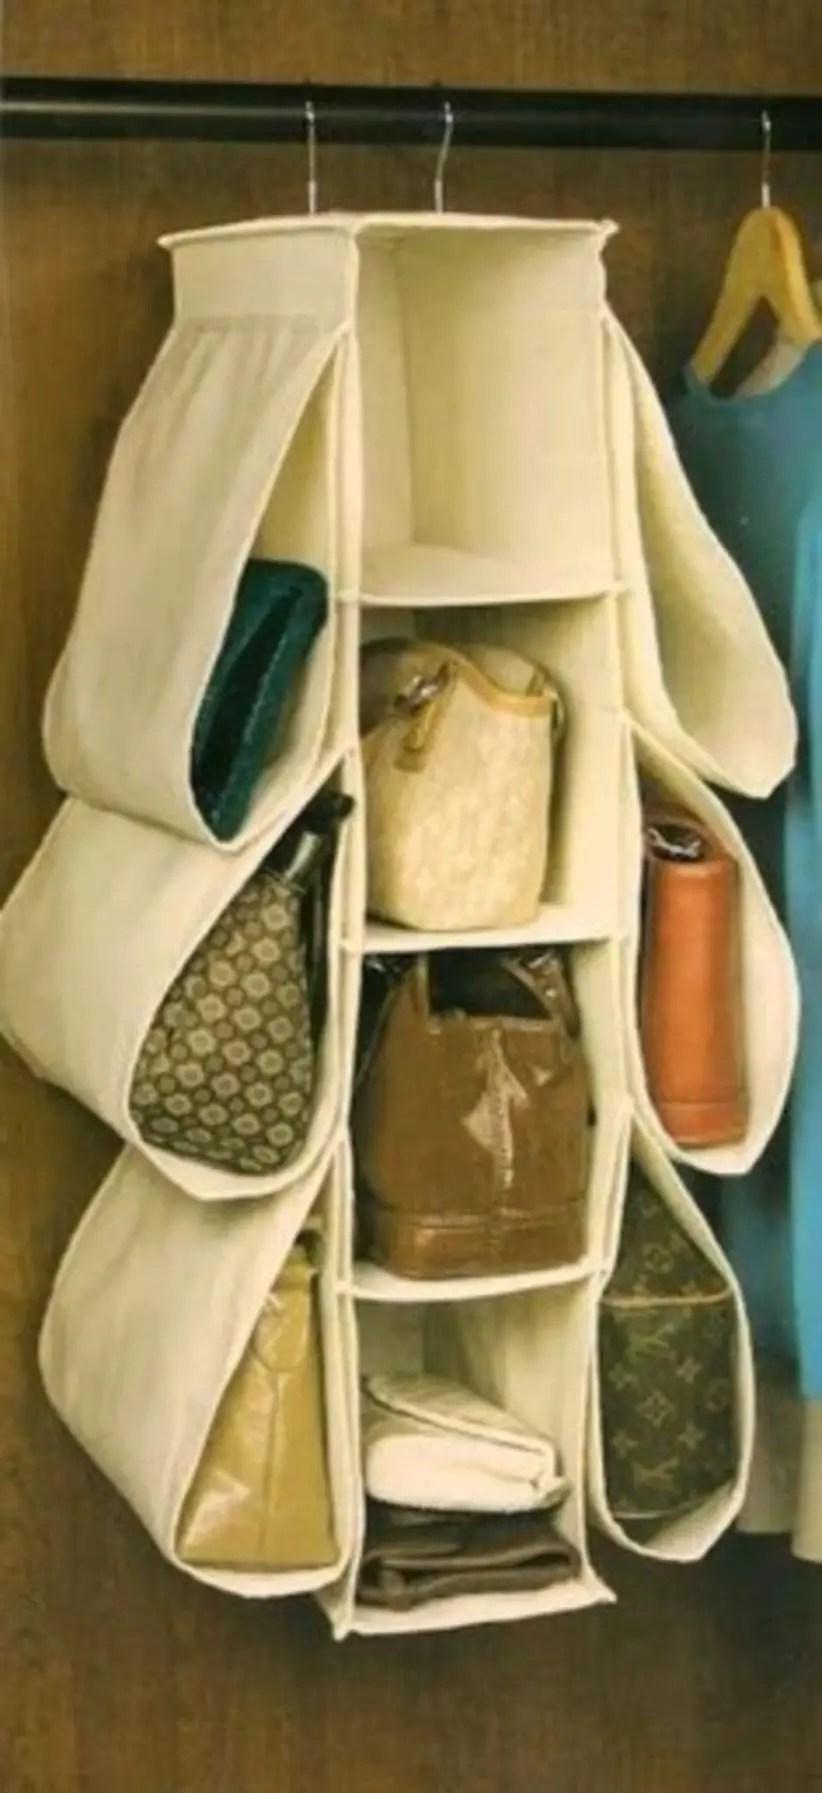 Creative hacks to organize your stuff for garage storage 19